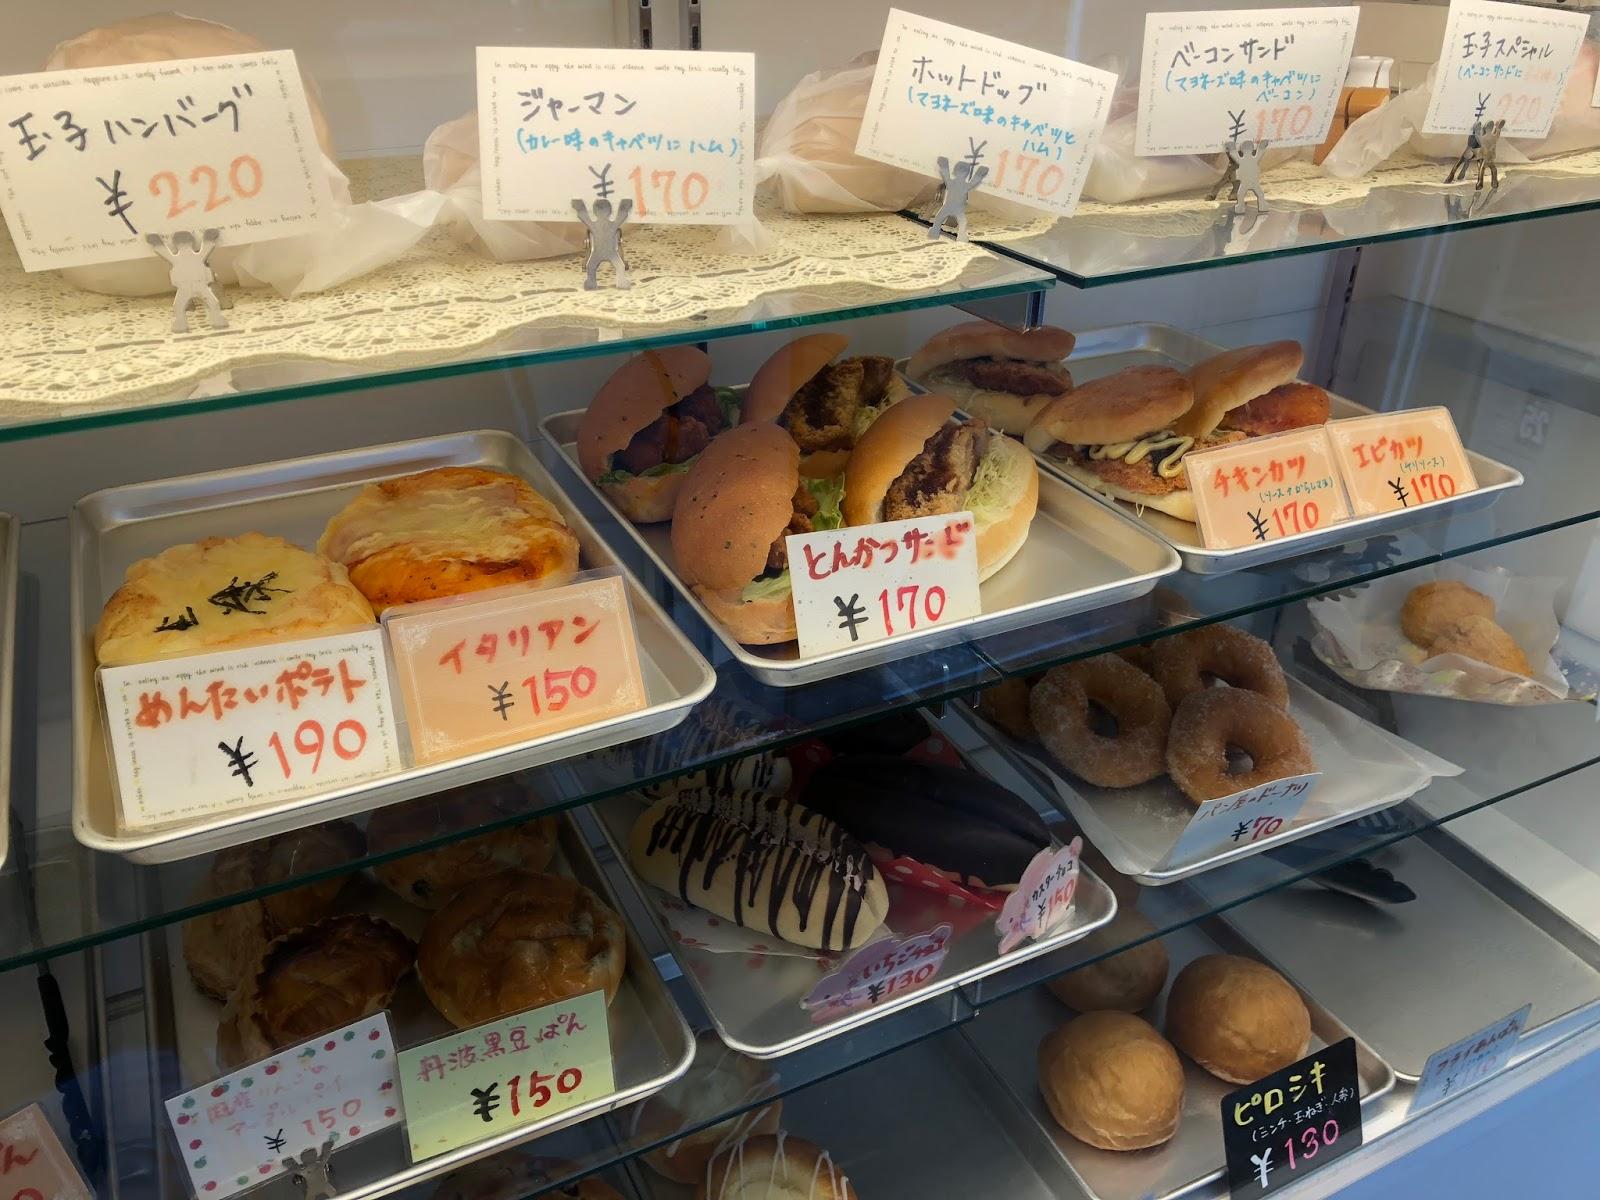 MoVe on 旅食: [大阪] 上本町懷舊麵包店 木村屋